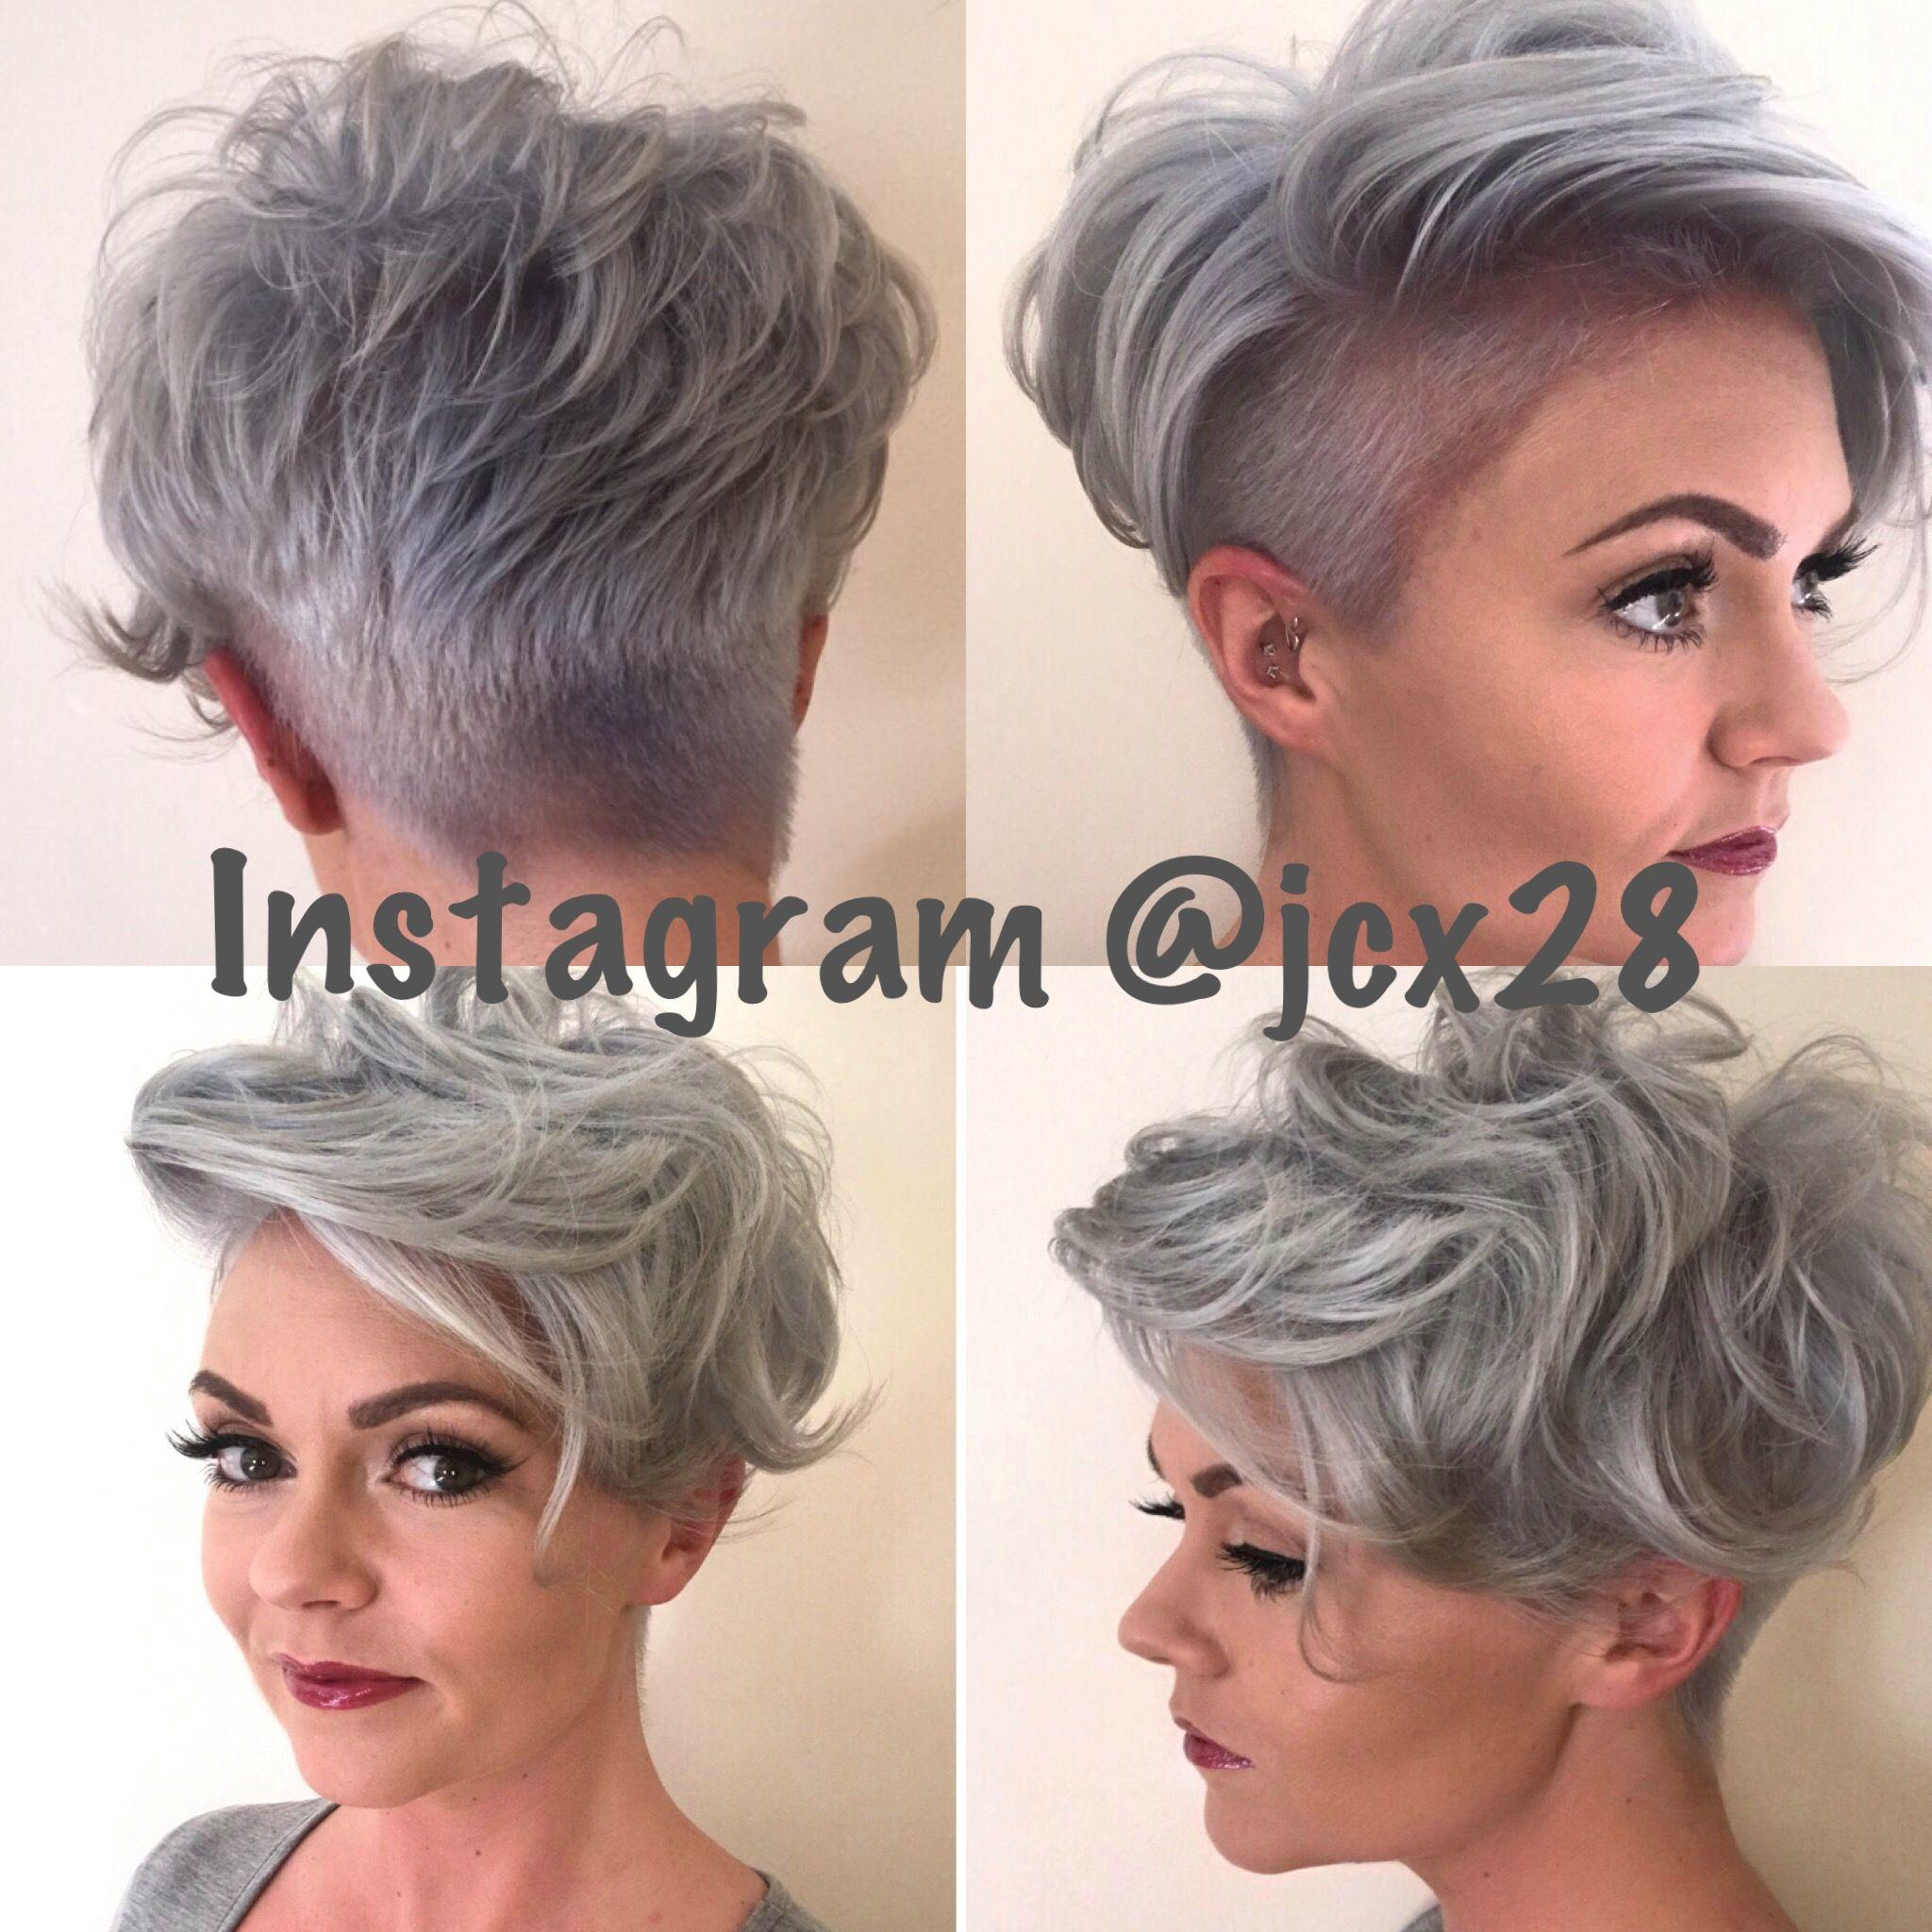 silver pixie cut undercut, shaved sides, grey hair, short